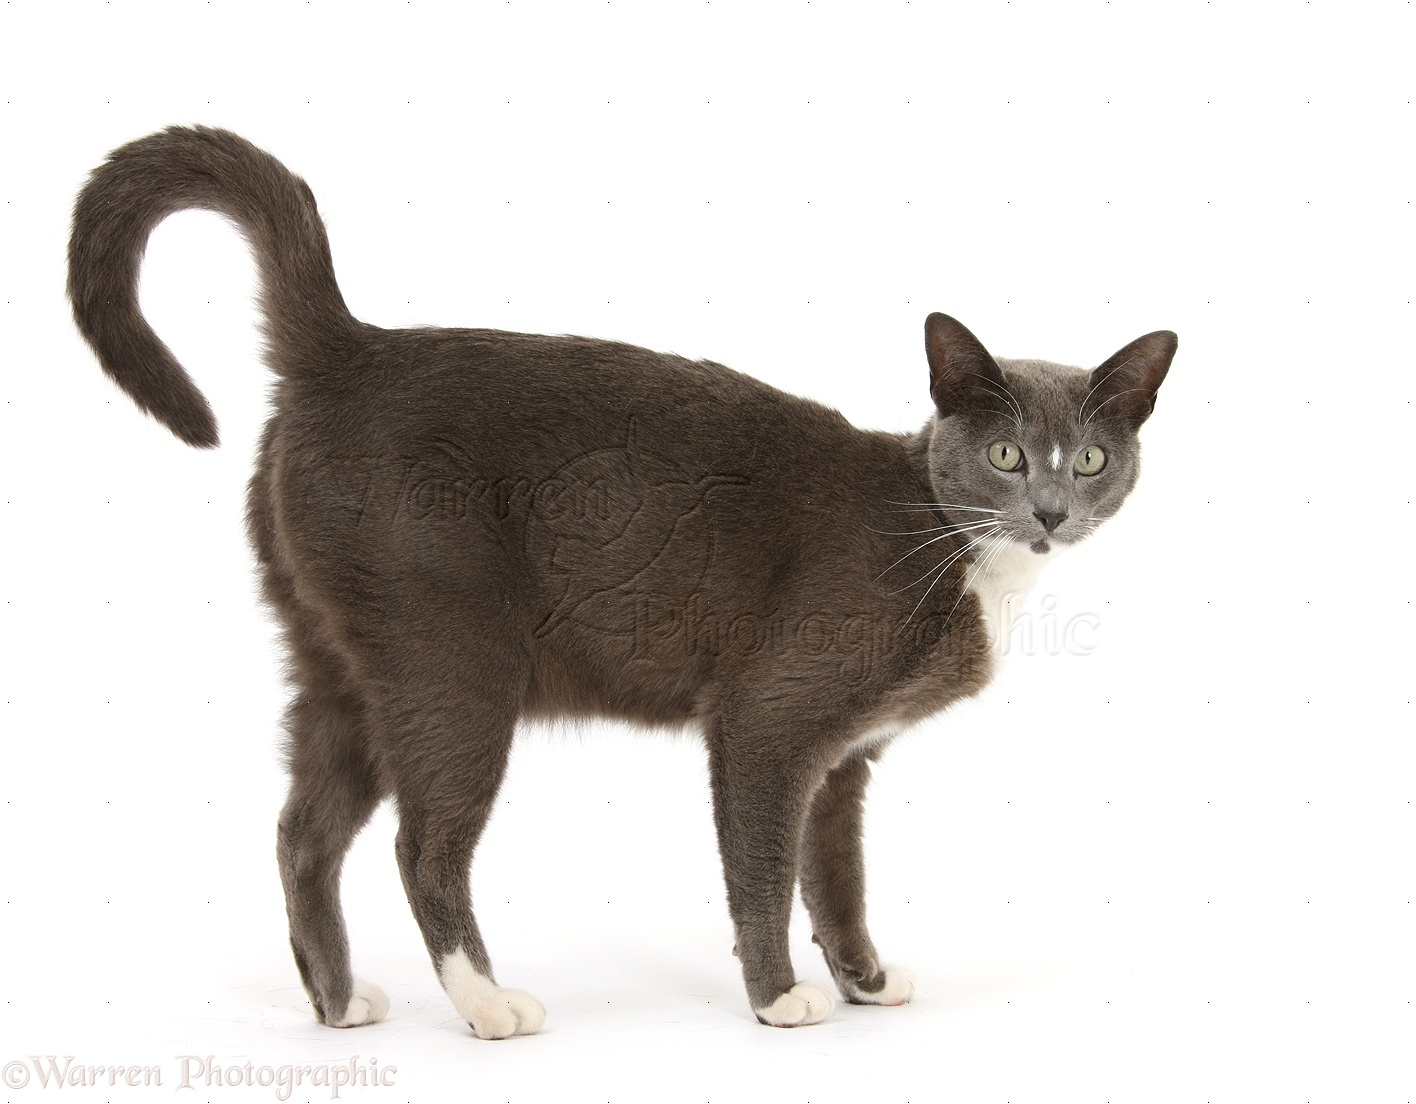 cat paw print vs dog